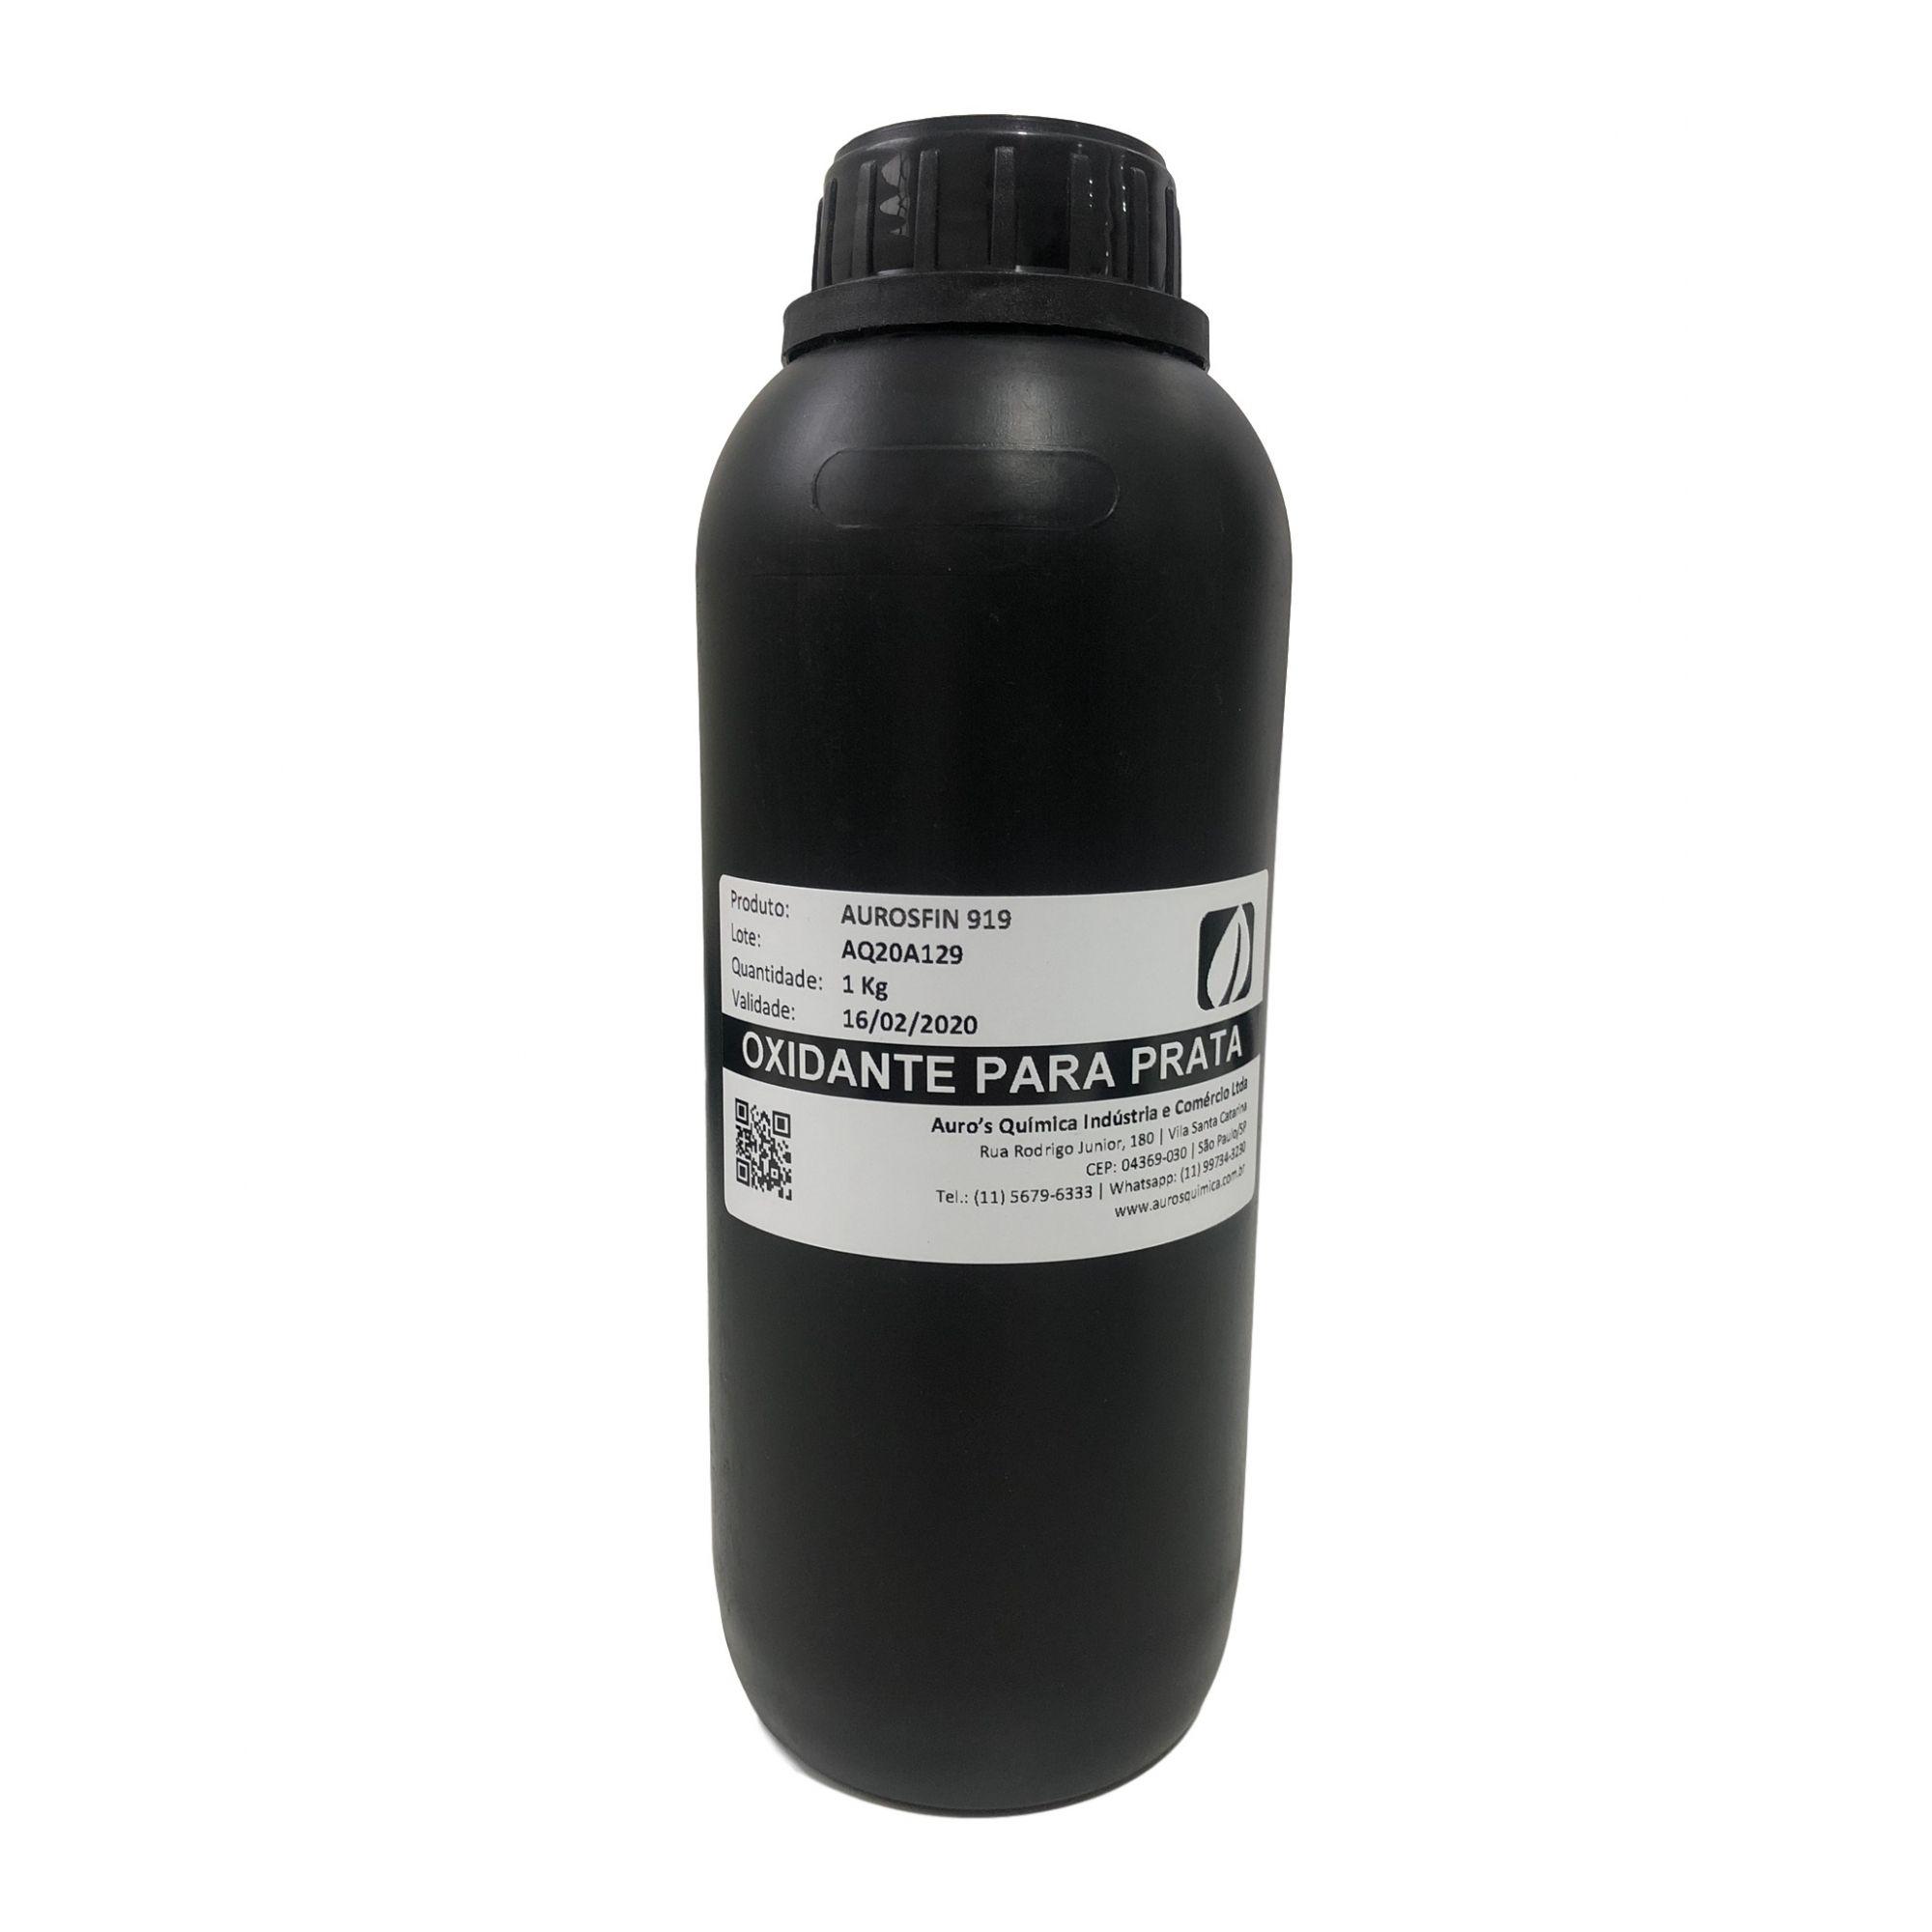 Oxidante para Prata - 1 Litro